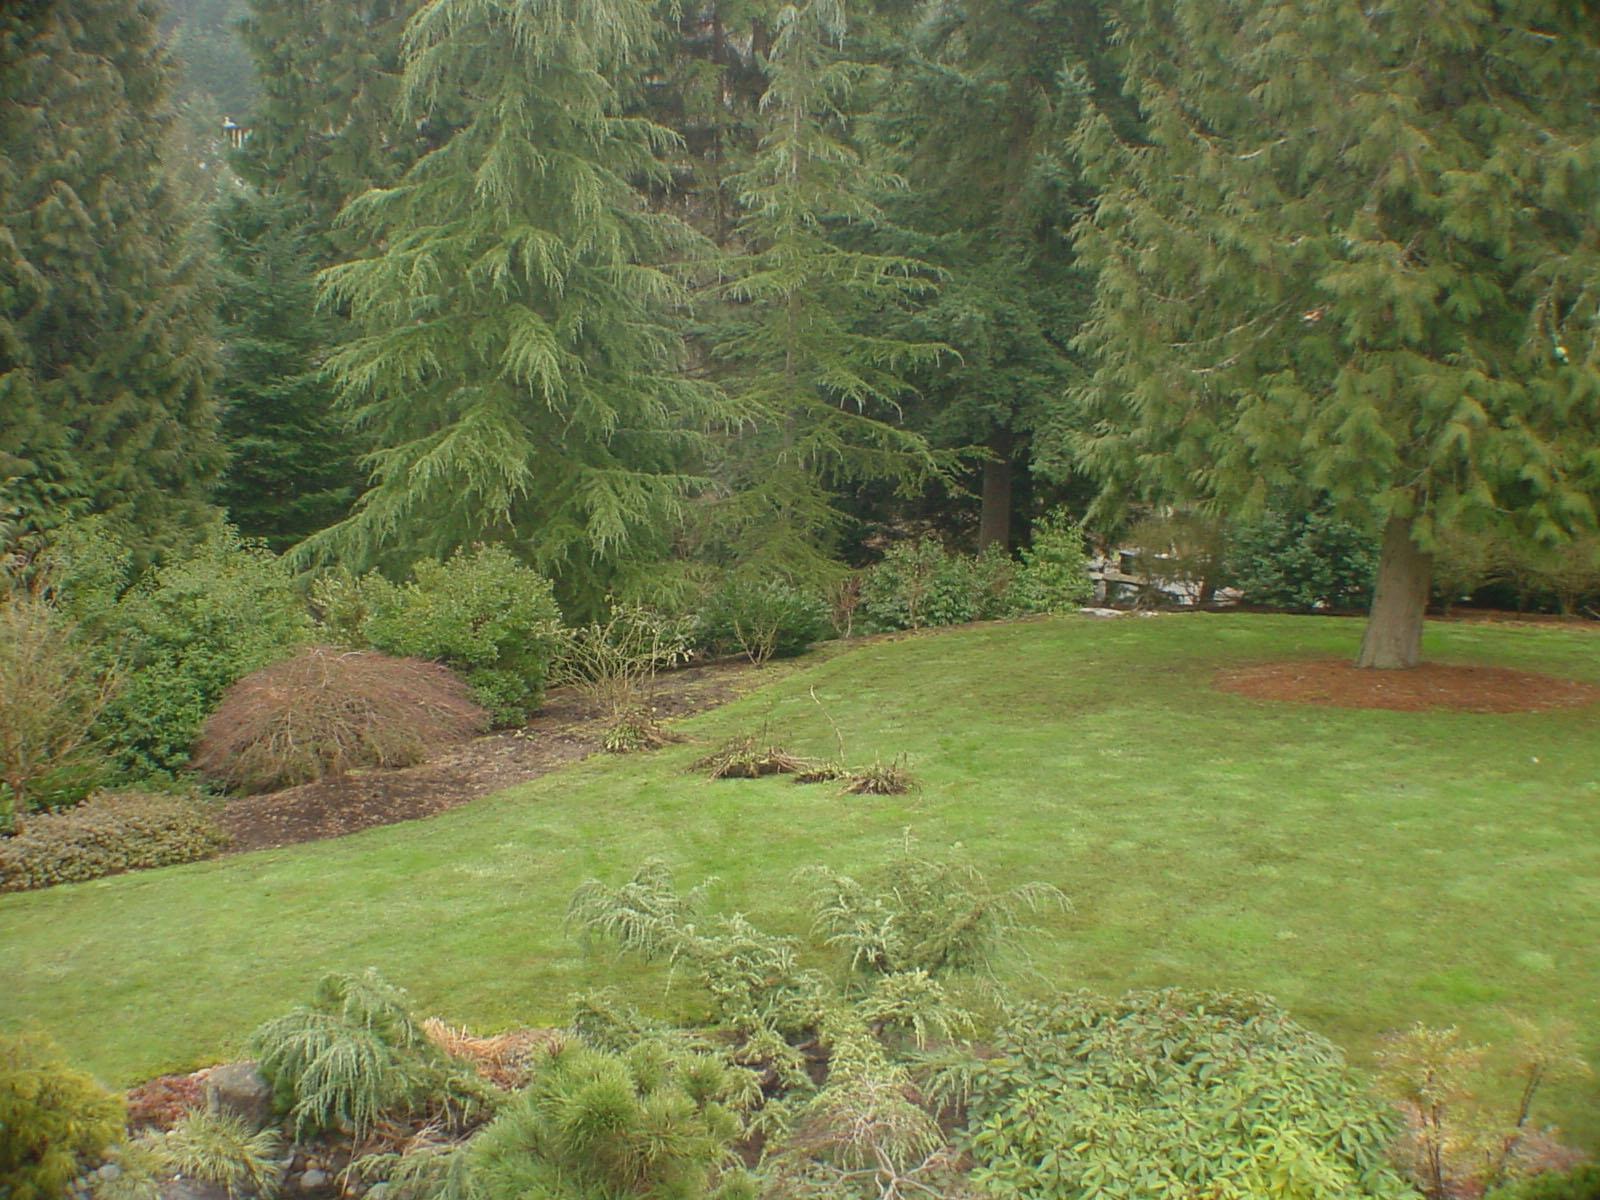 19guthrie planting 2 before.jpg